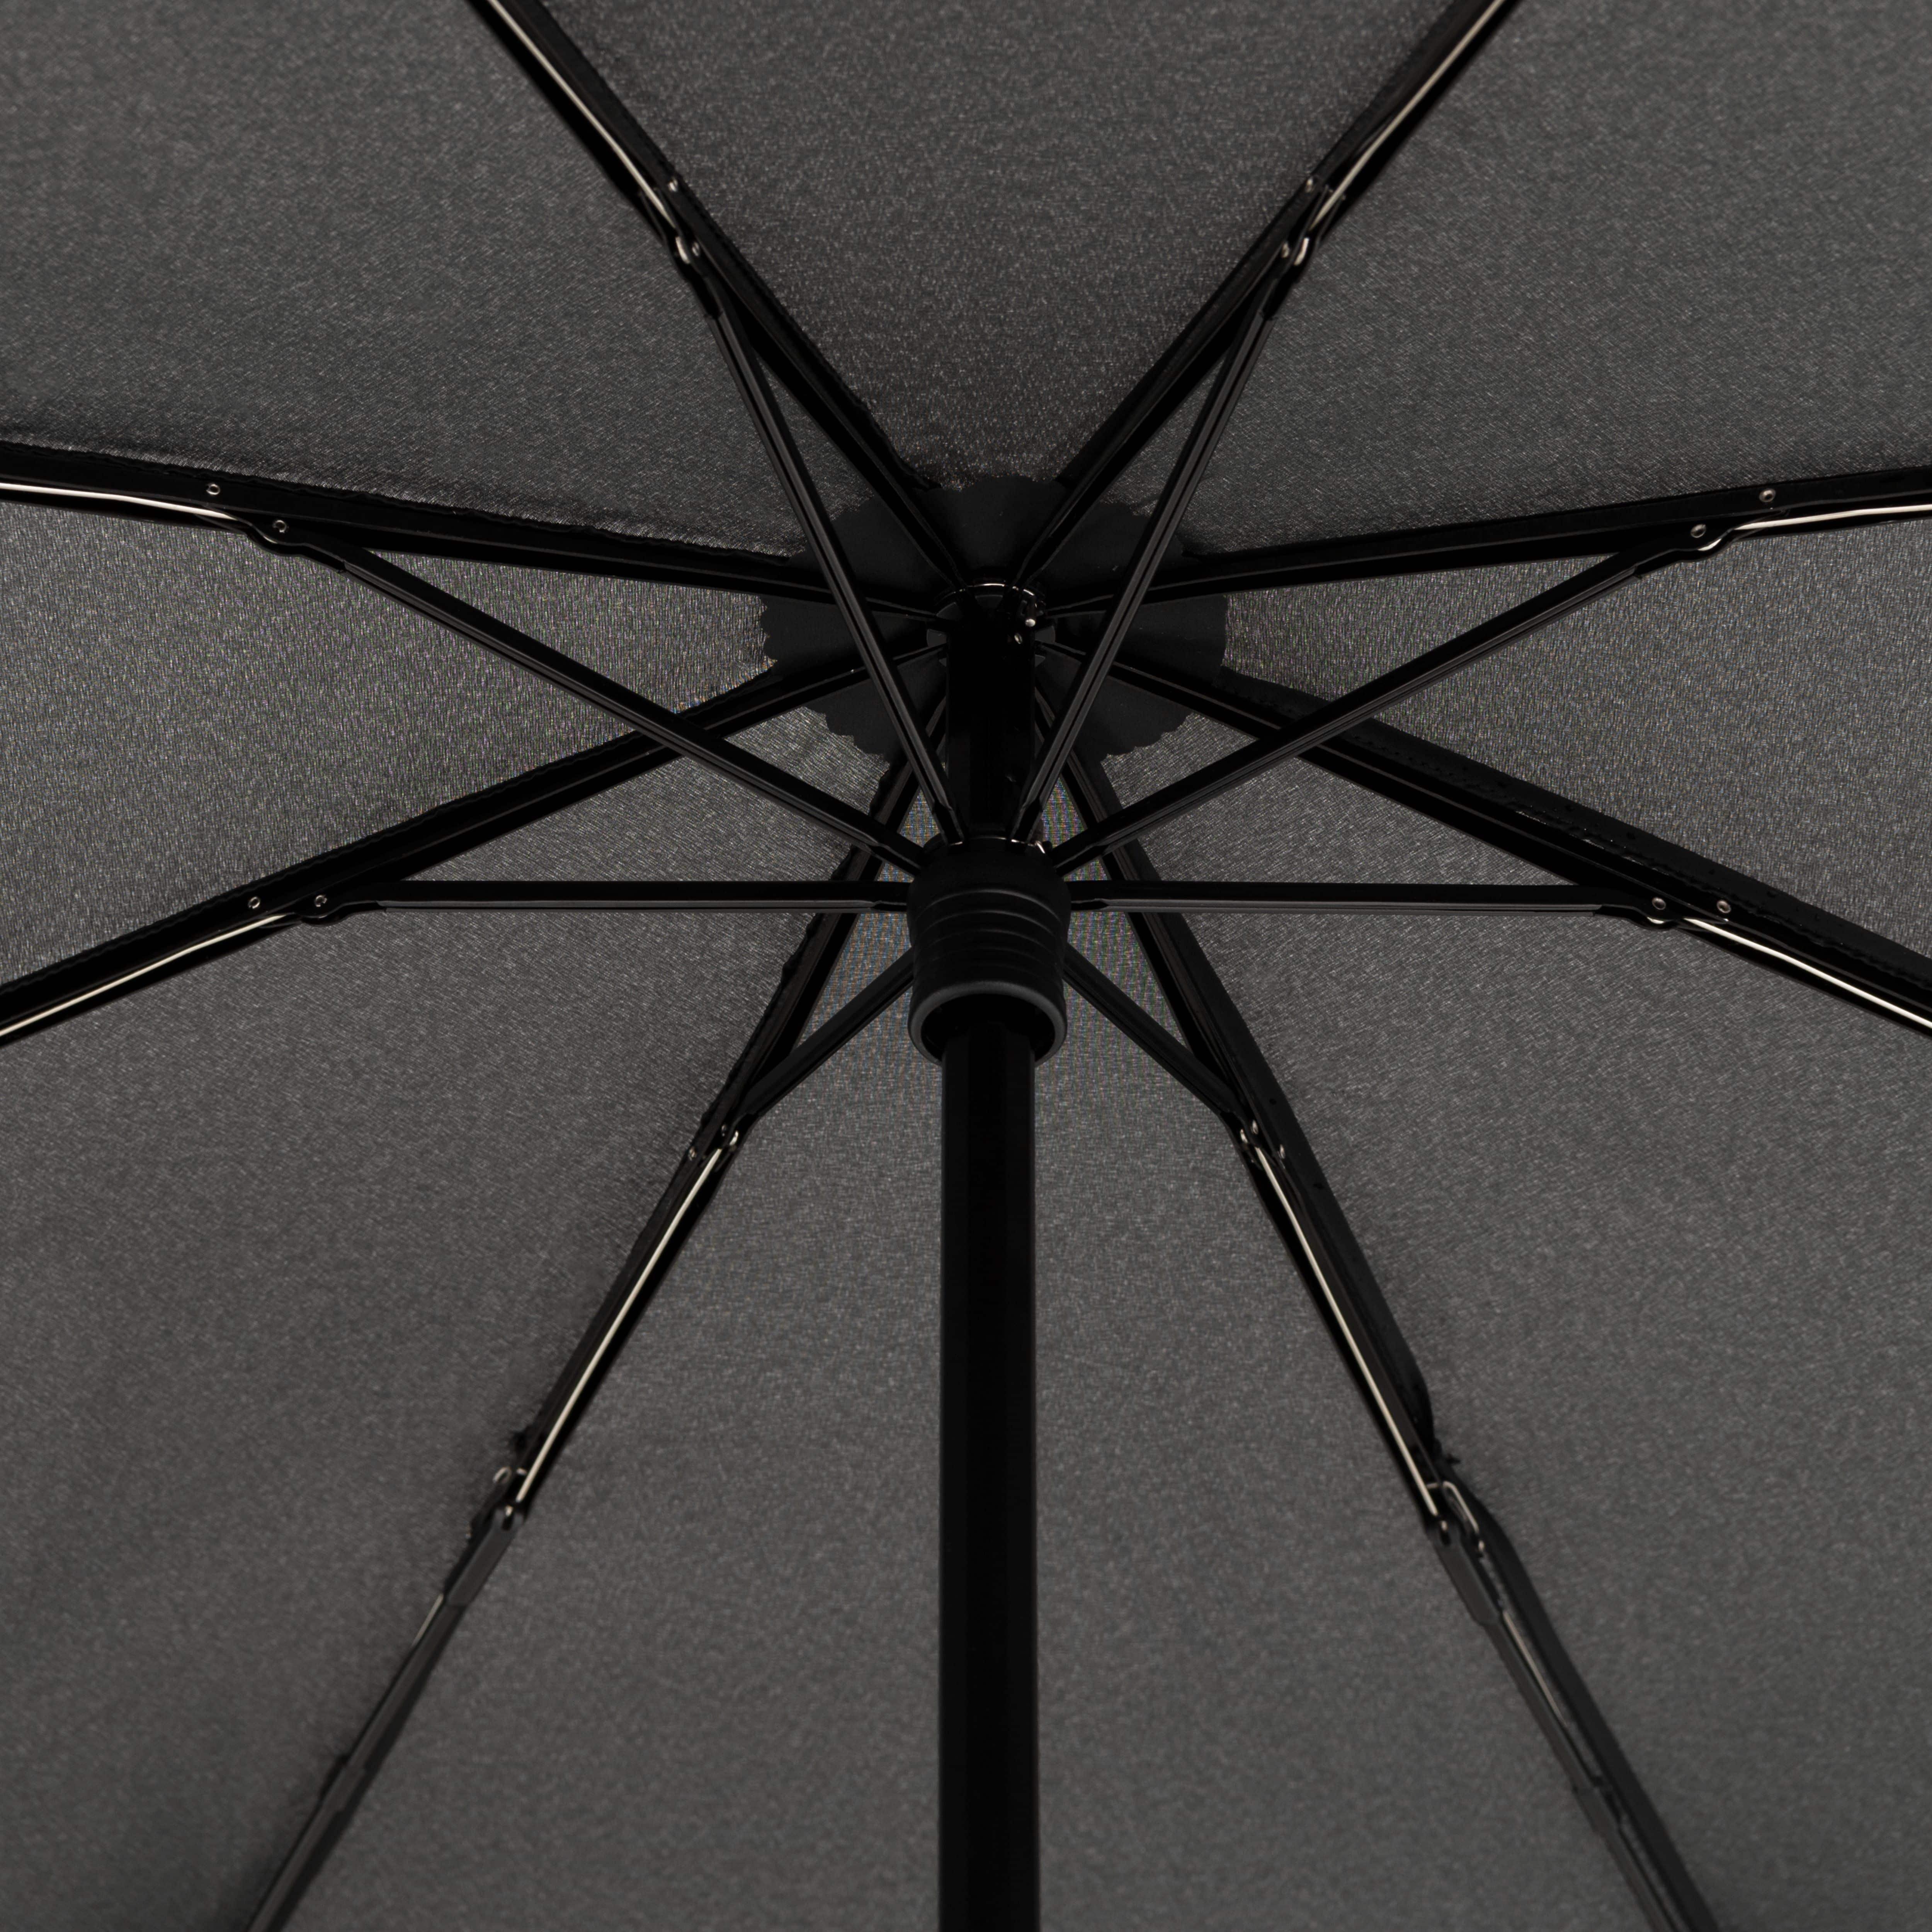 Knirps Umbrella U.090 Ultra Light XXL Manual Compact - photo 6